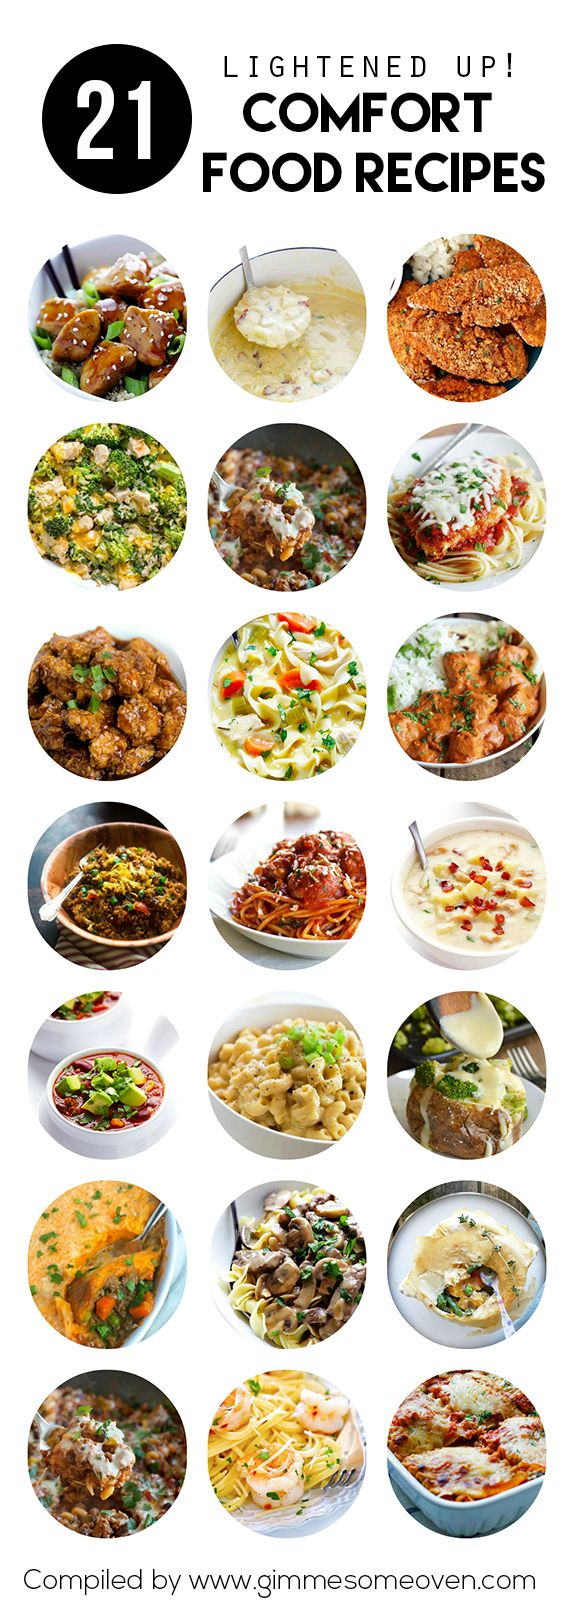 21 Lightened-Up Comfort Food Recipes